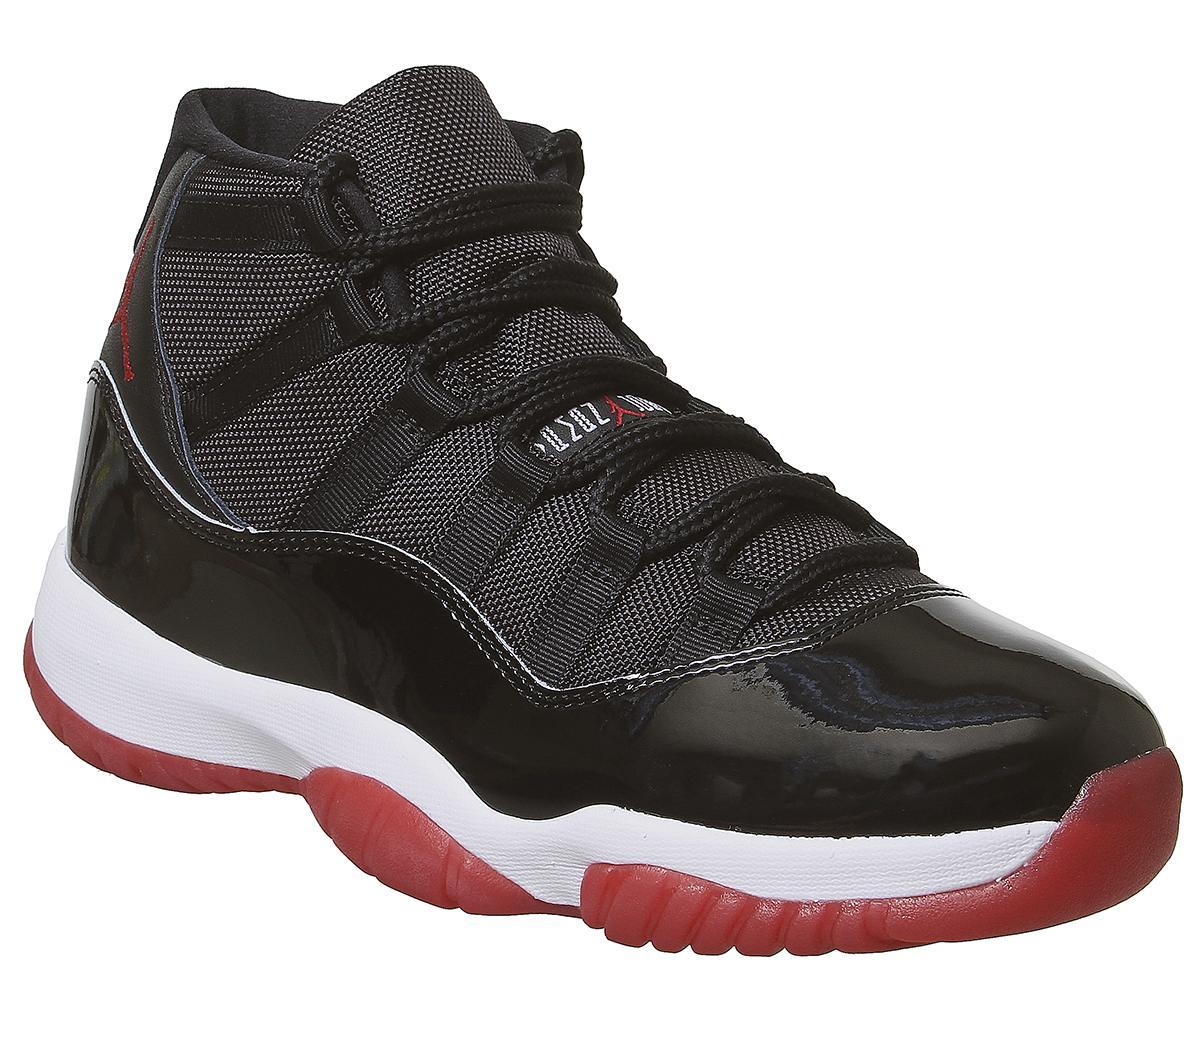 pedir disculpas sanar Transeúnte  Jordan Jordan 11 Retro Trainers Bred Black Red - His trainers